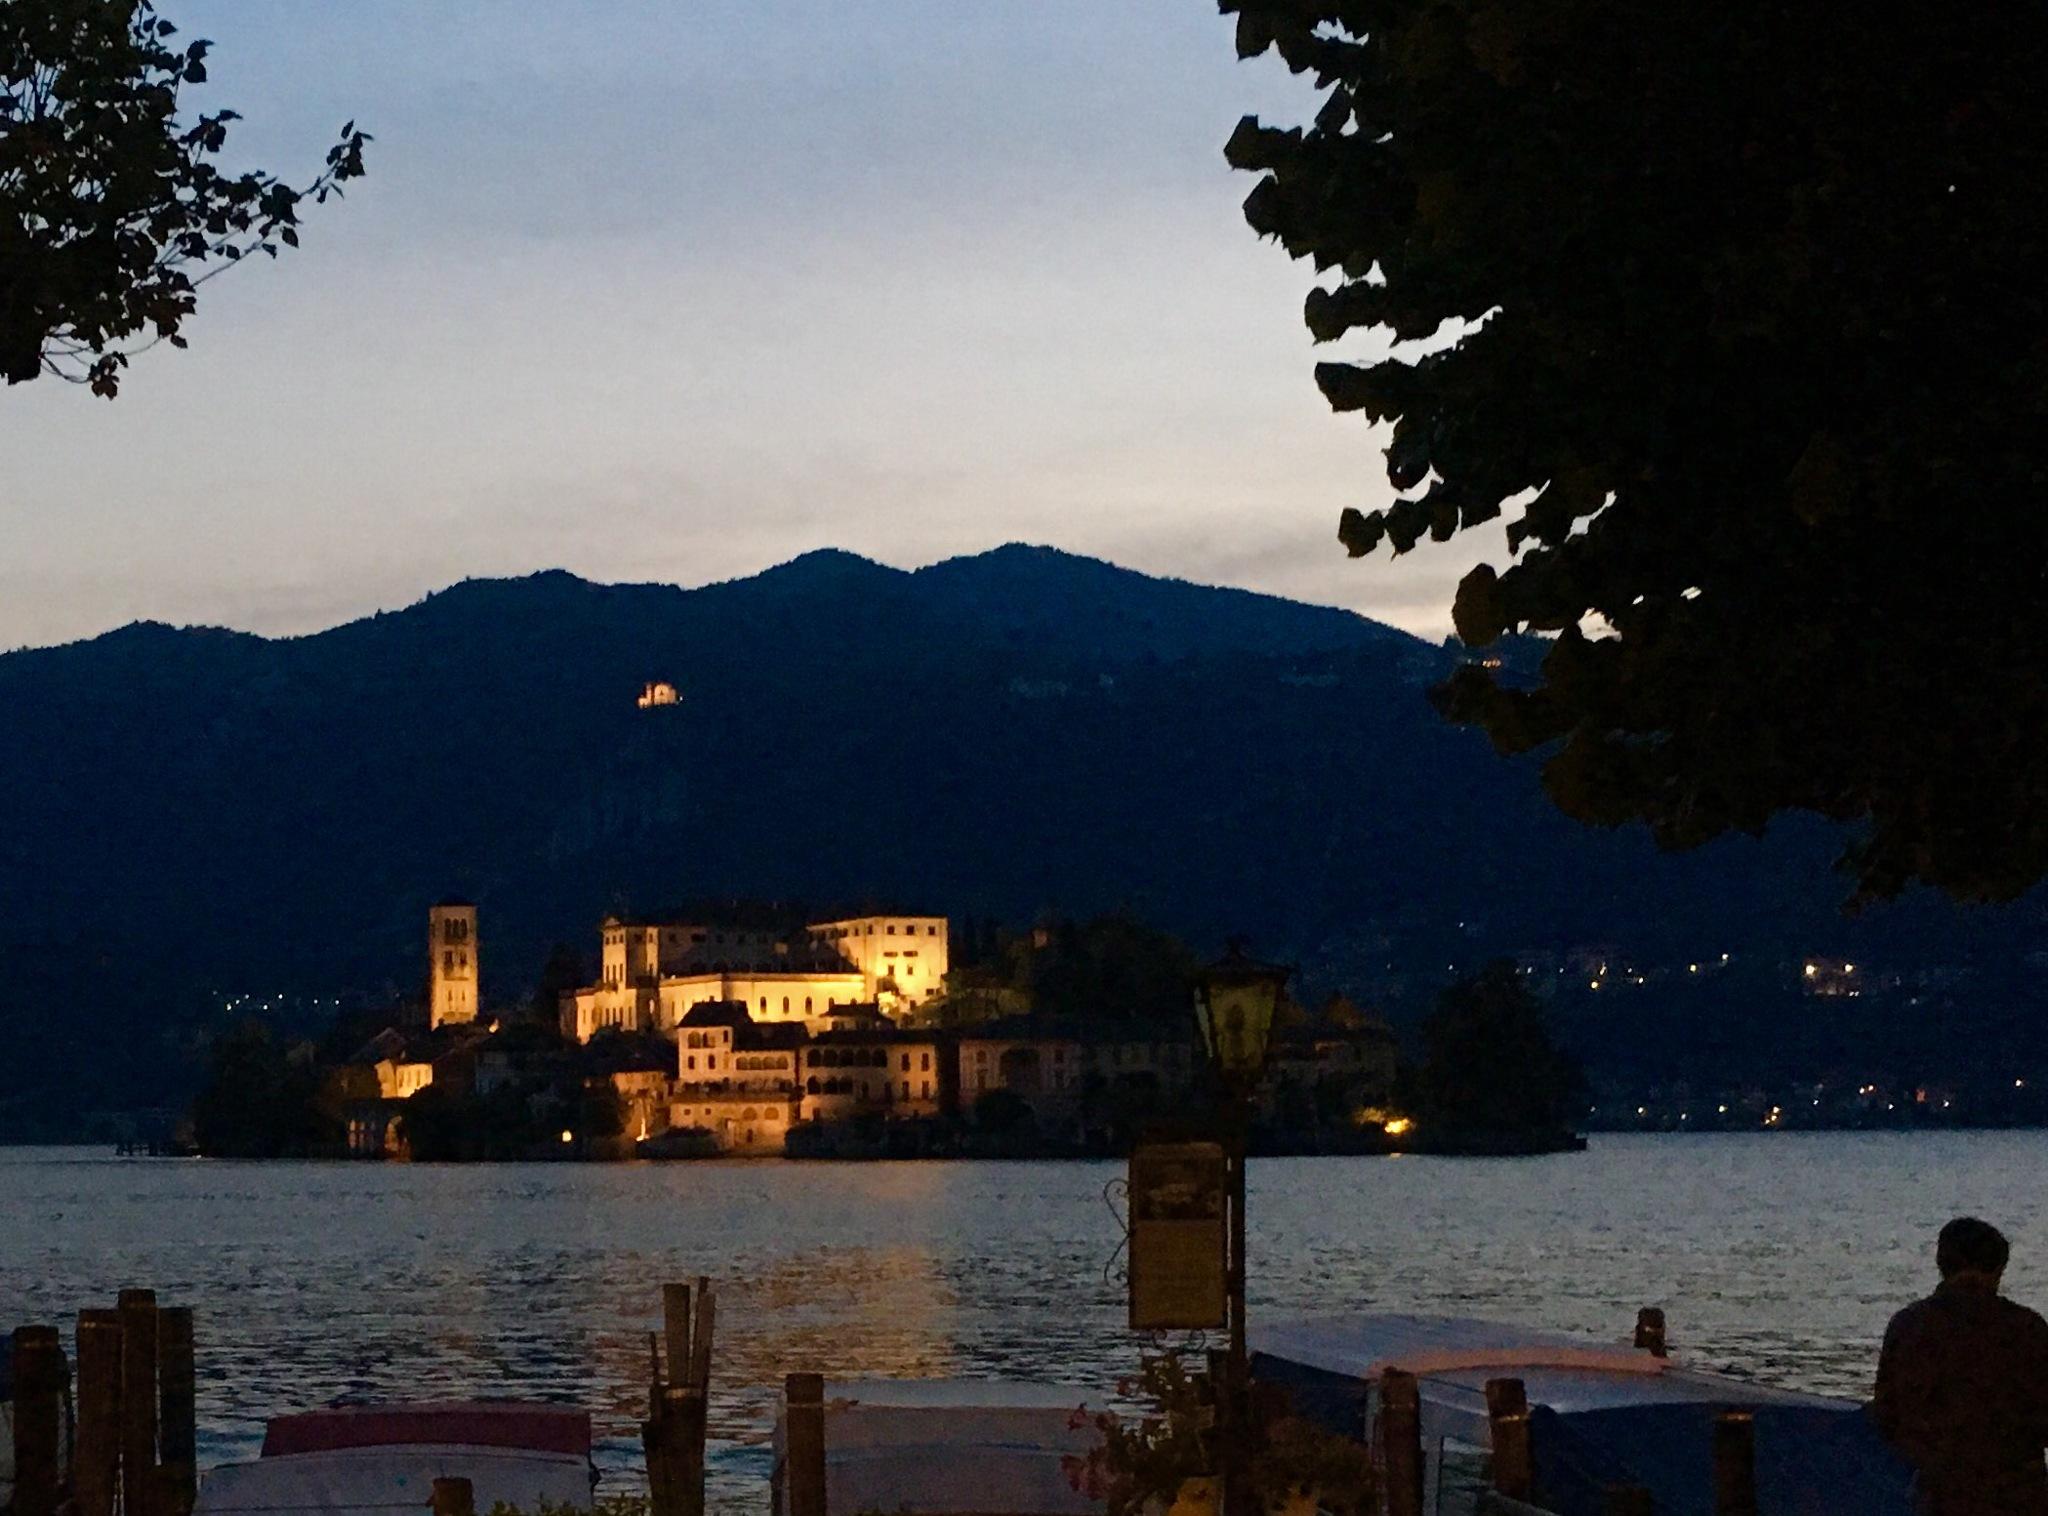 Island on lake Orta in Italy by swisstraveller